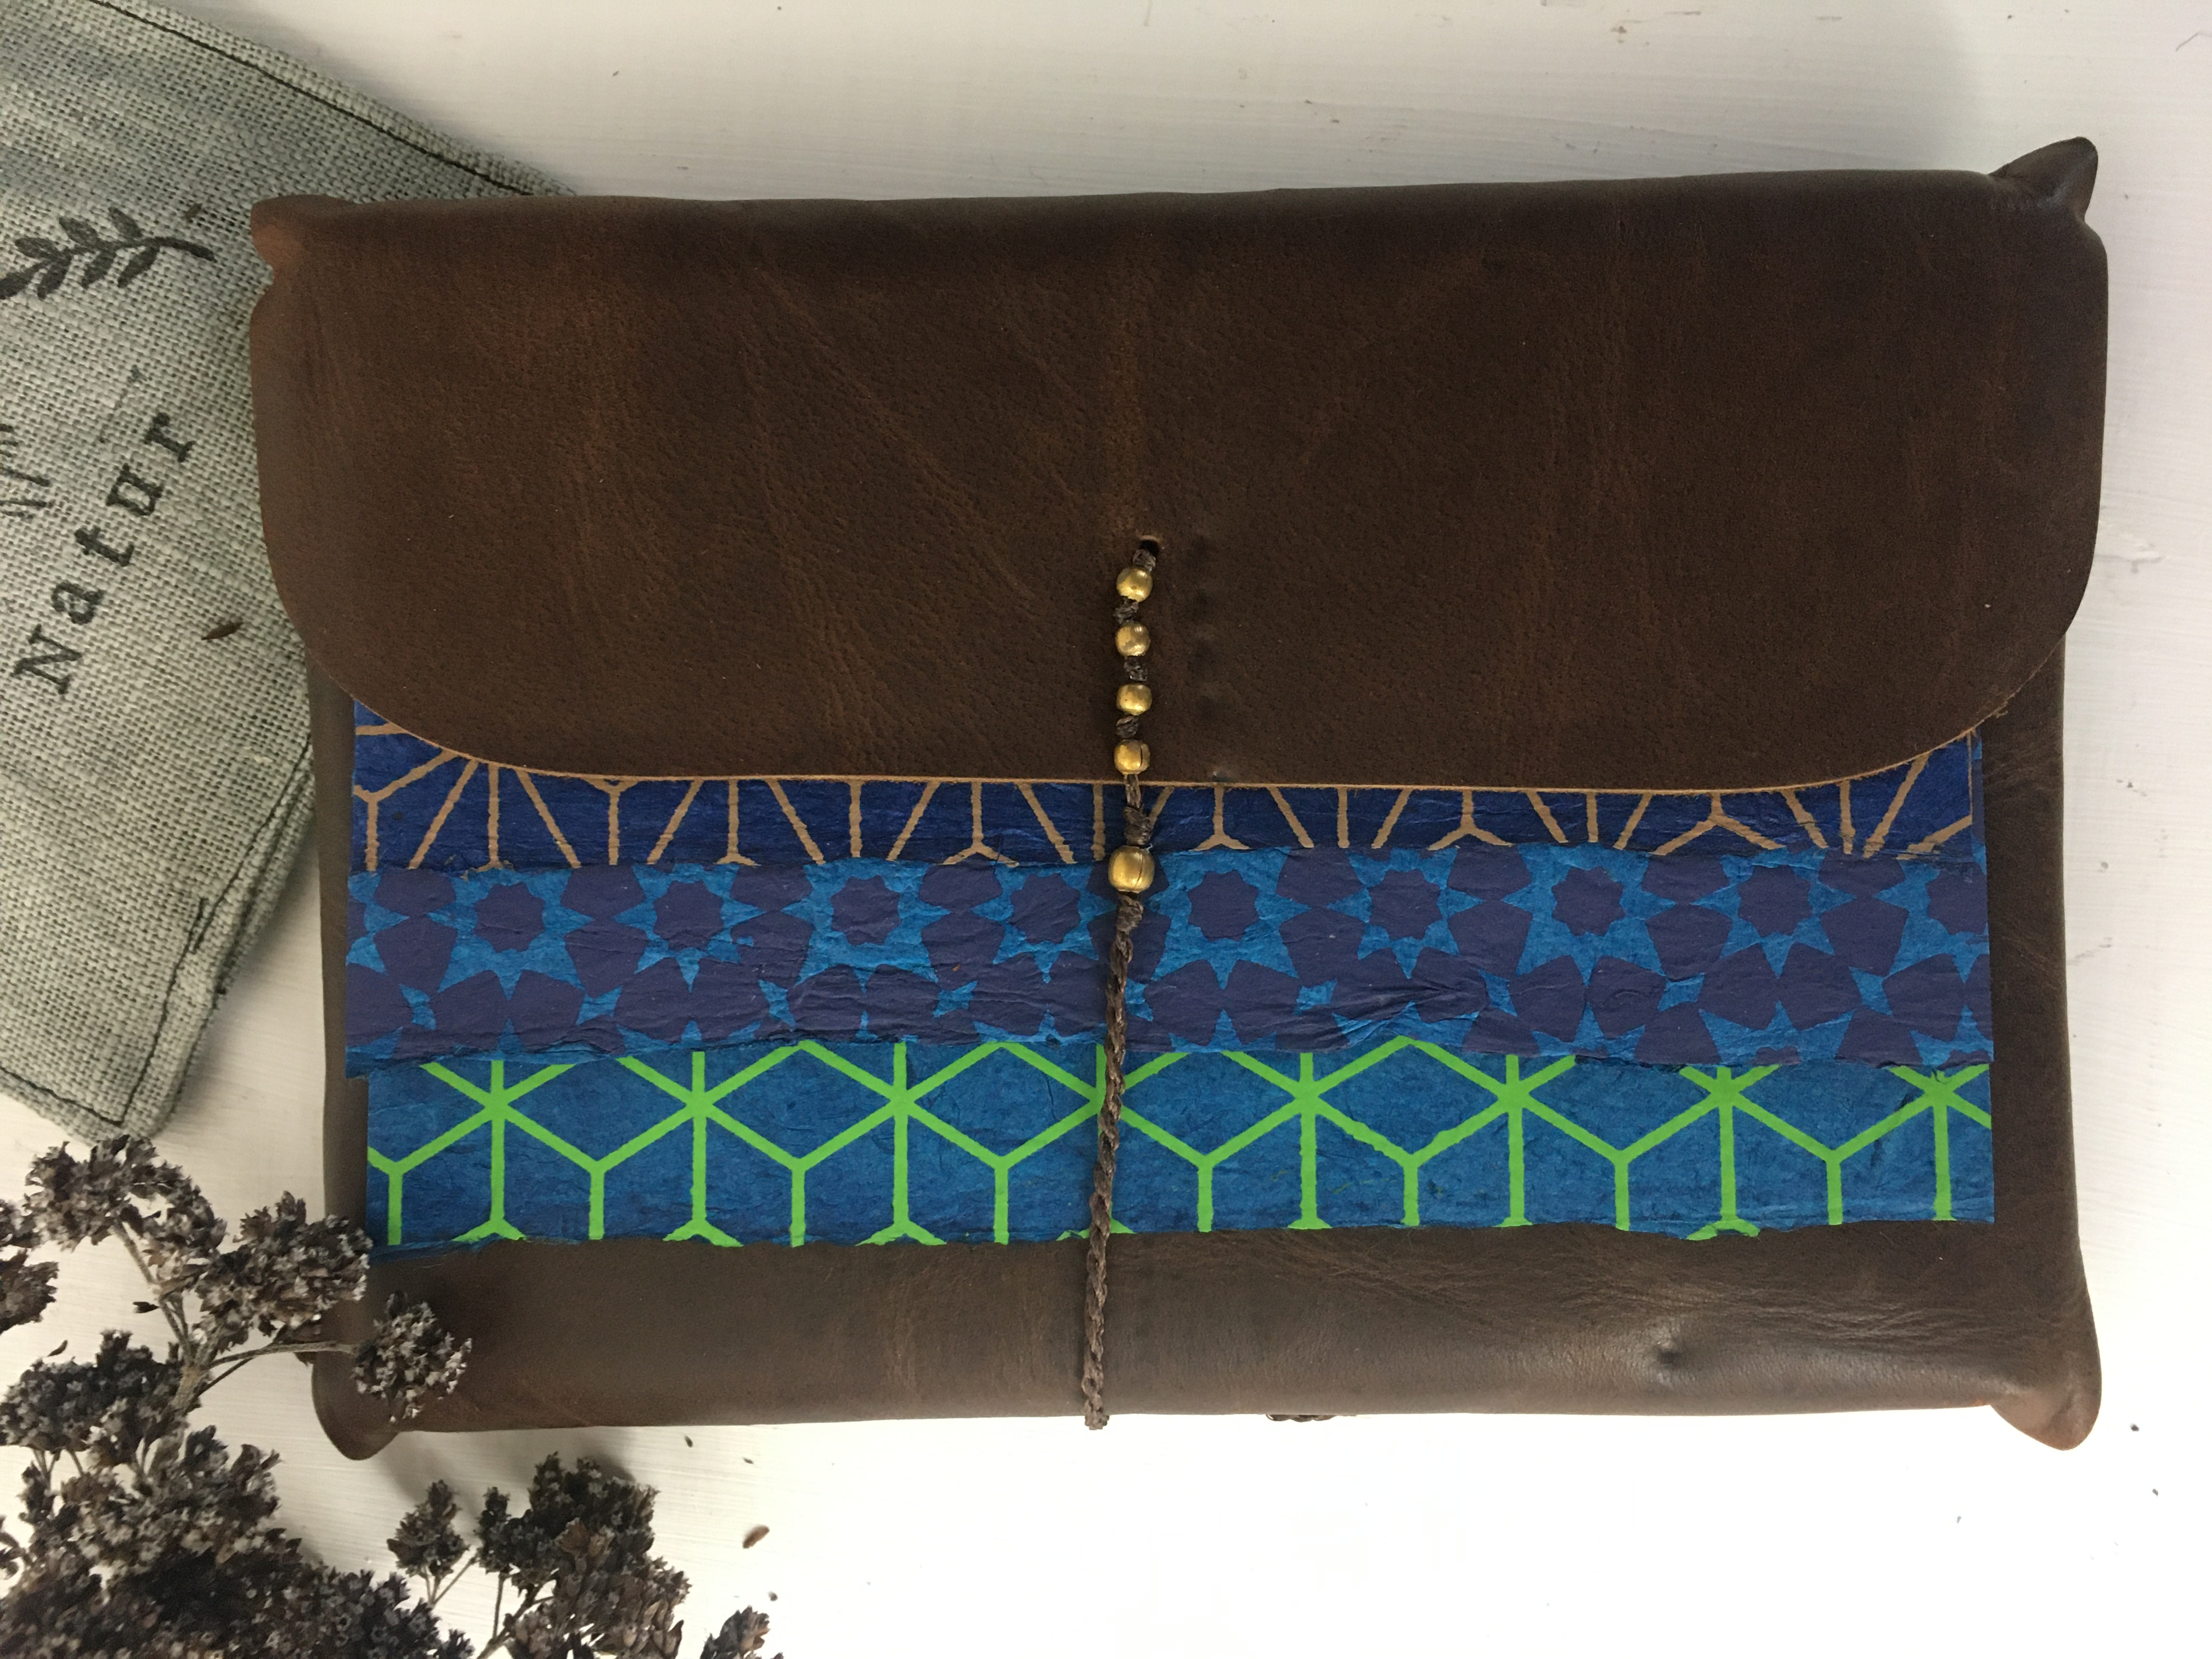 Notizbuch echtes Leder Handarbeit 11 x 15 cm Blau-Grün